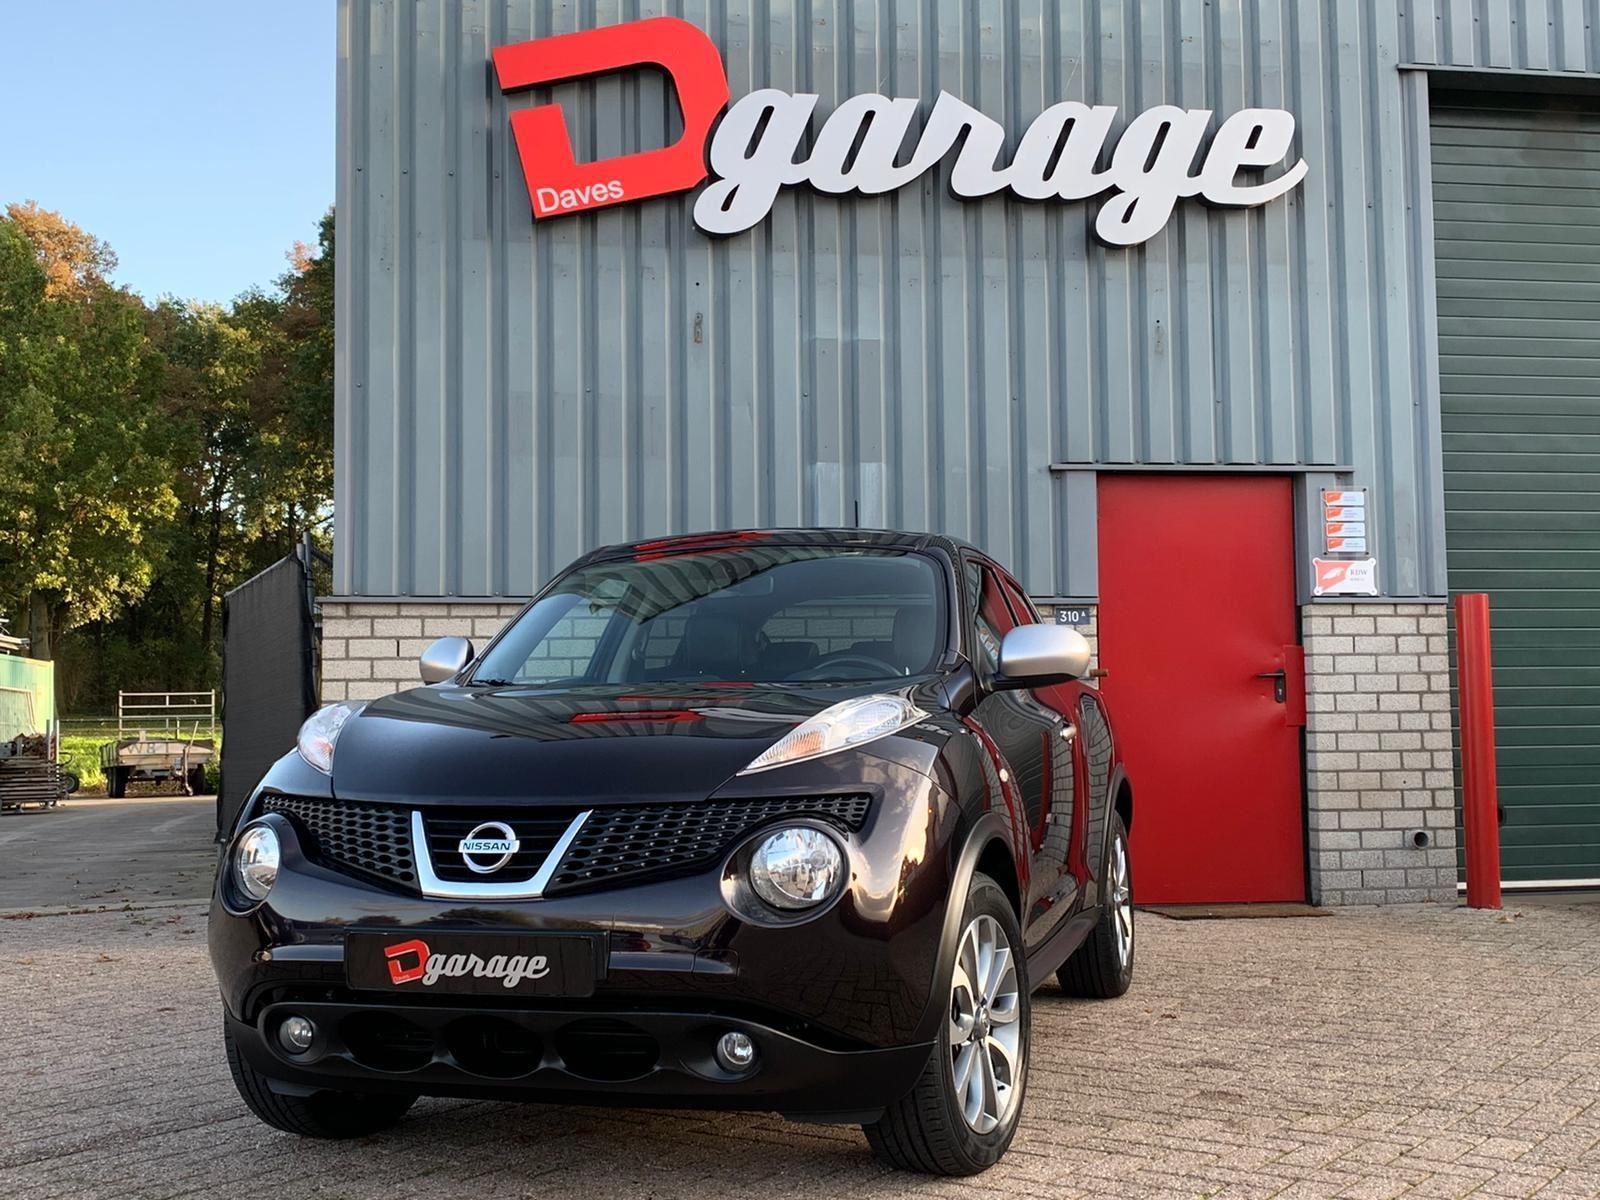 Nissan Juke occasion - Dave's Garage